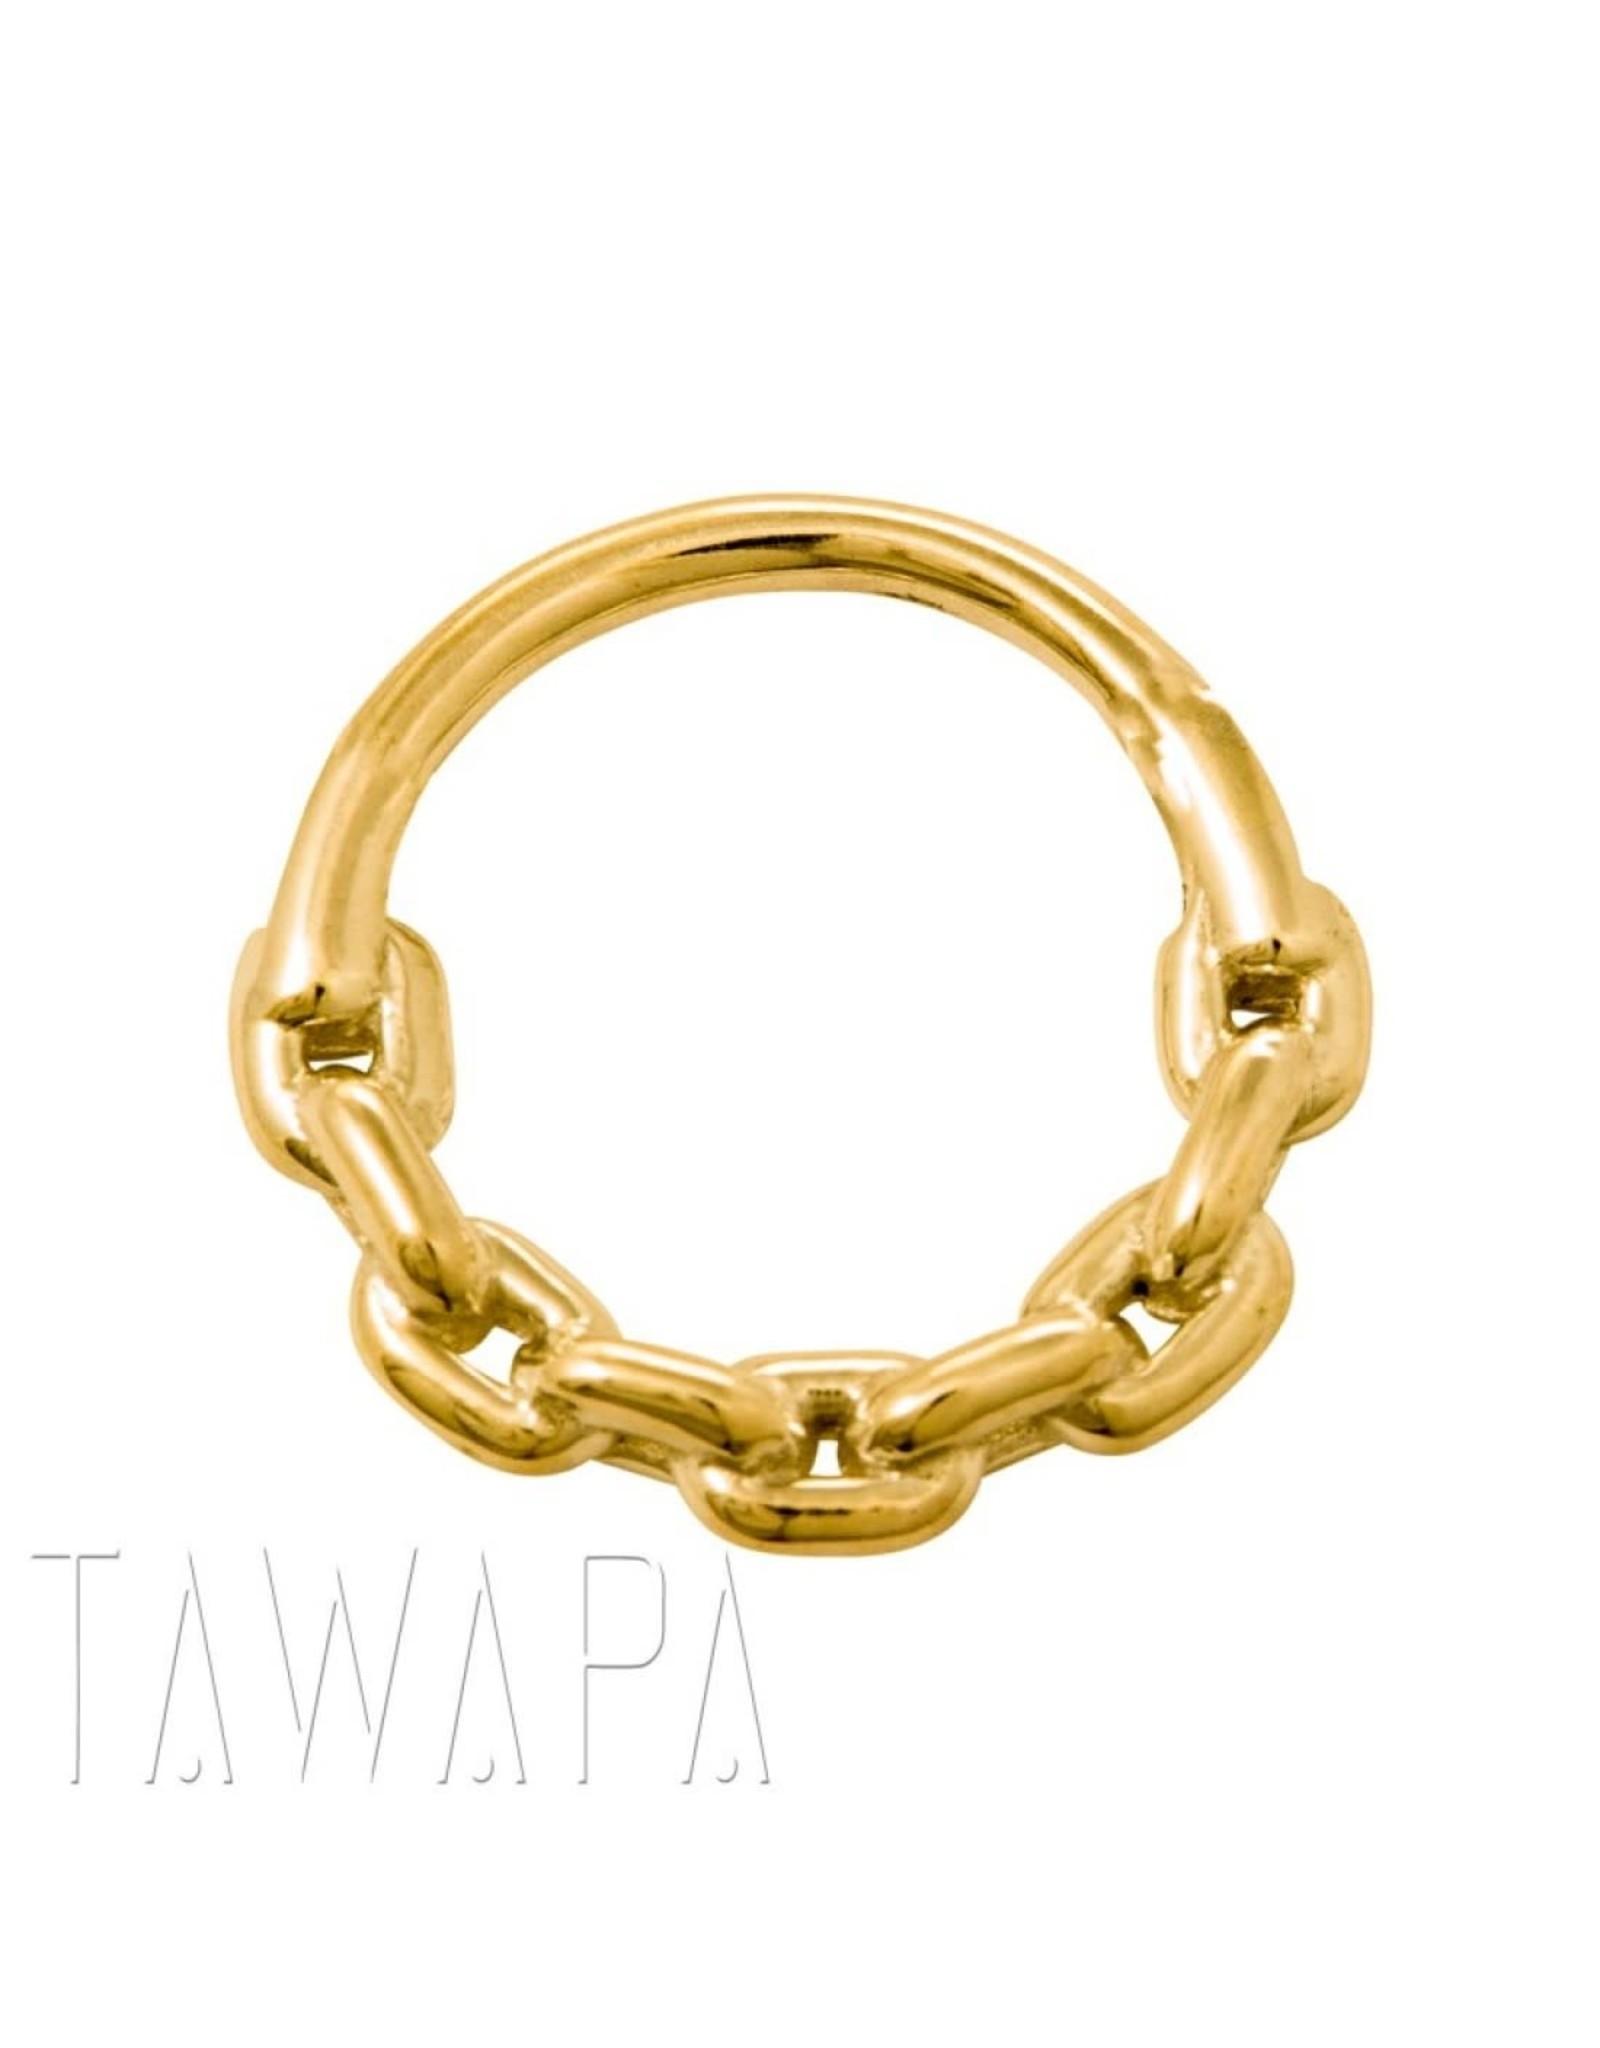 Tawapa Tawapa 16g Chain Link seam ring